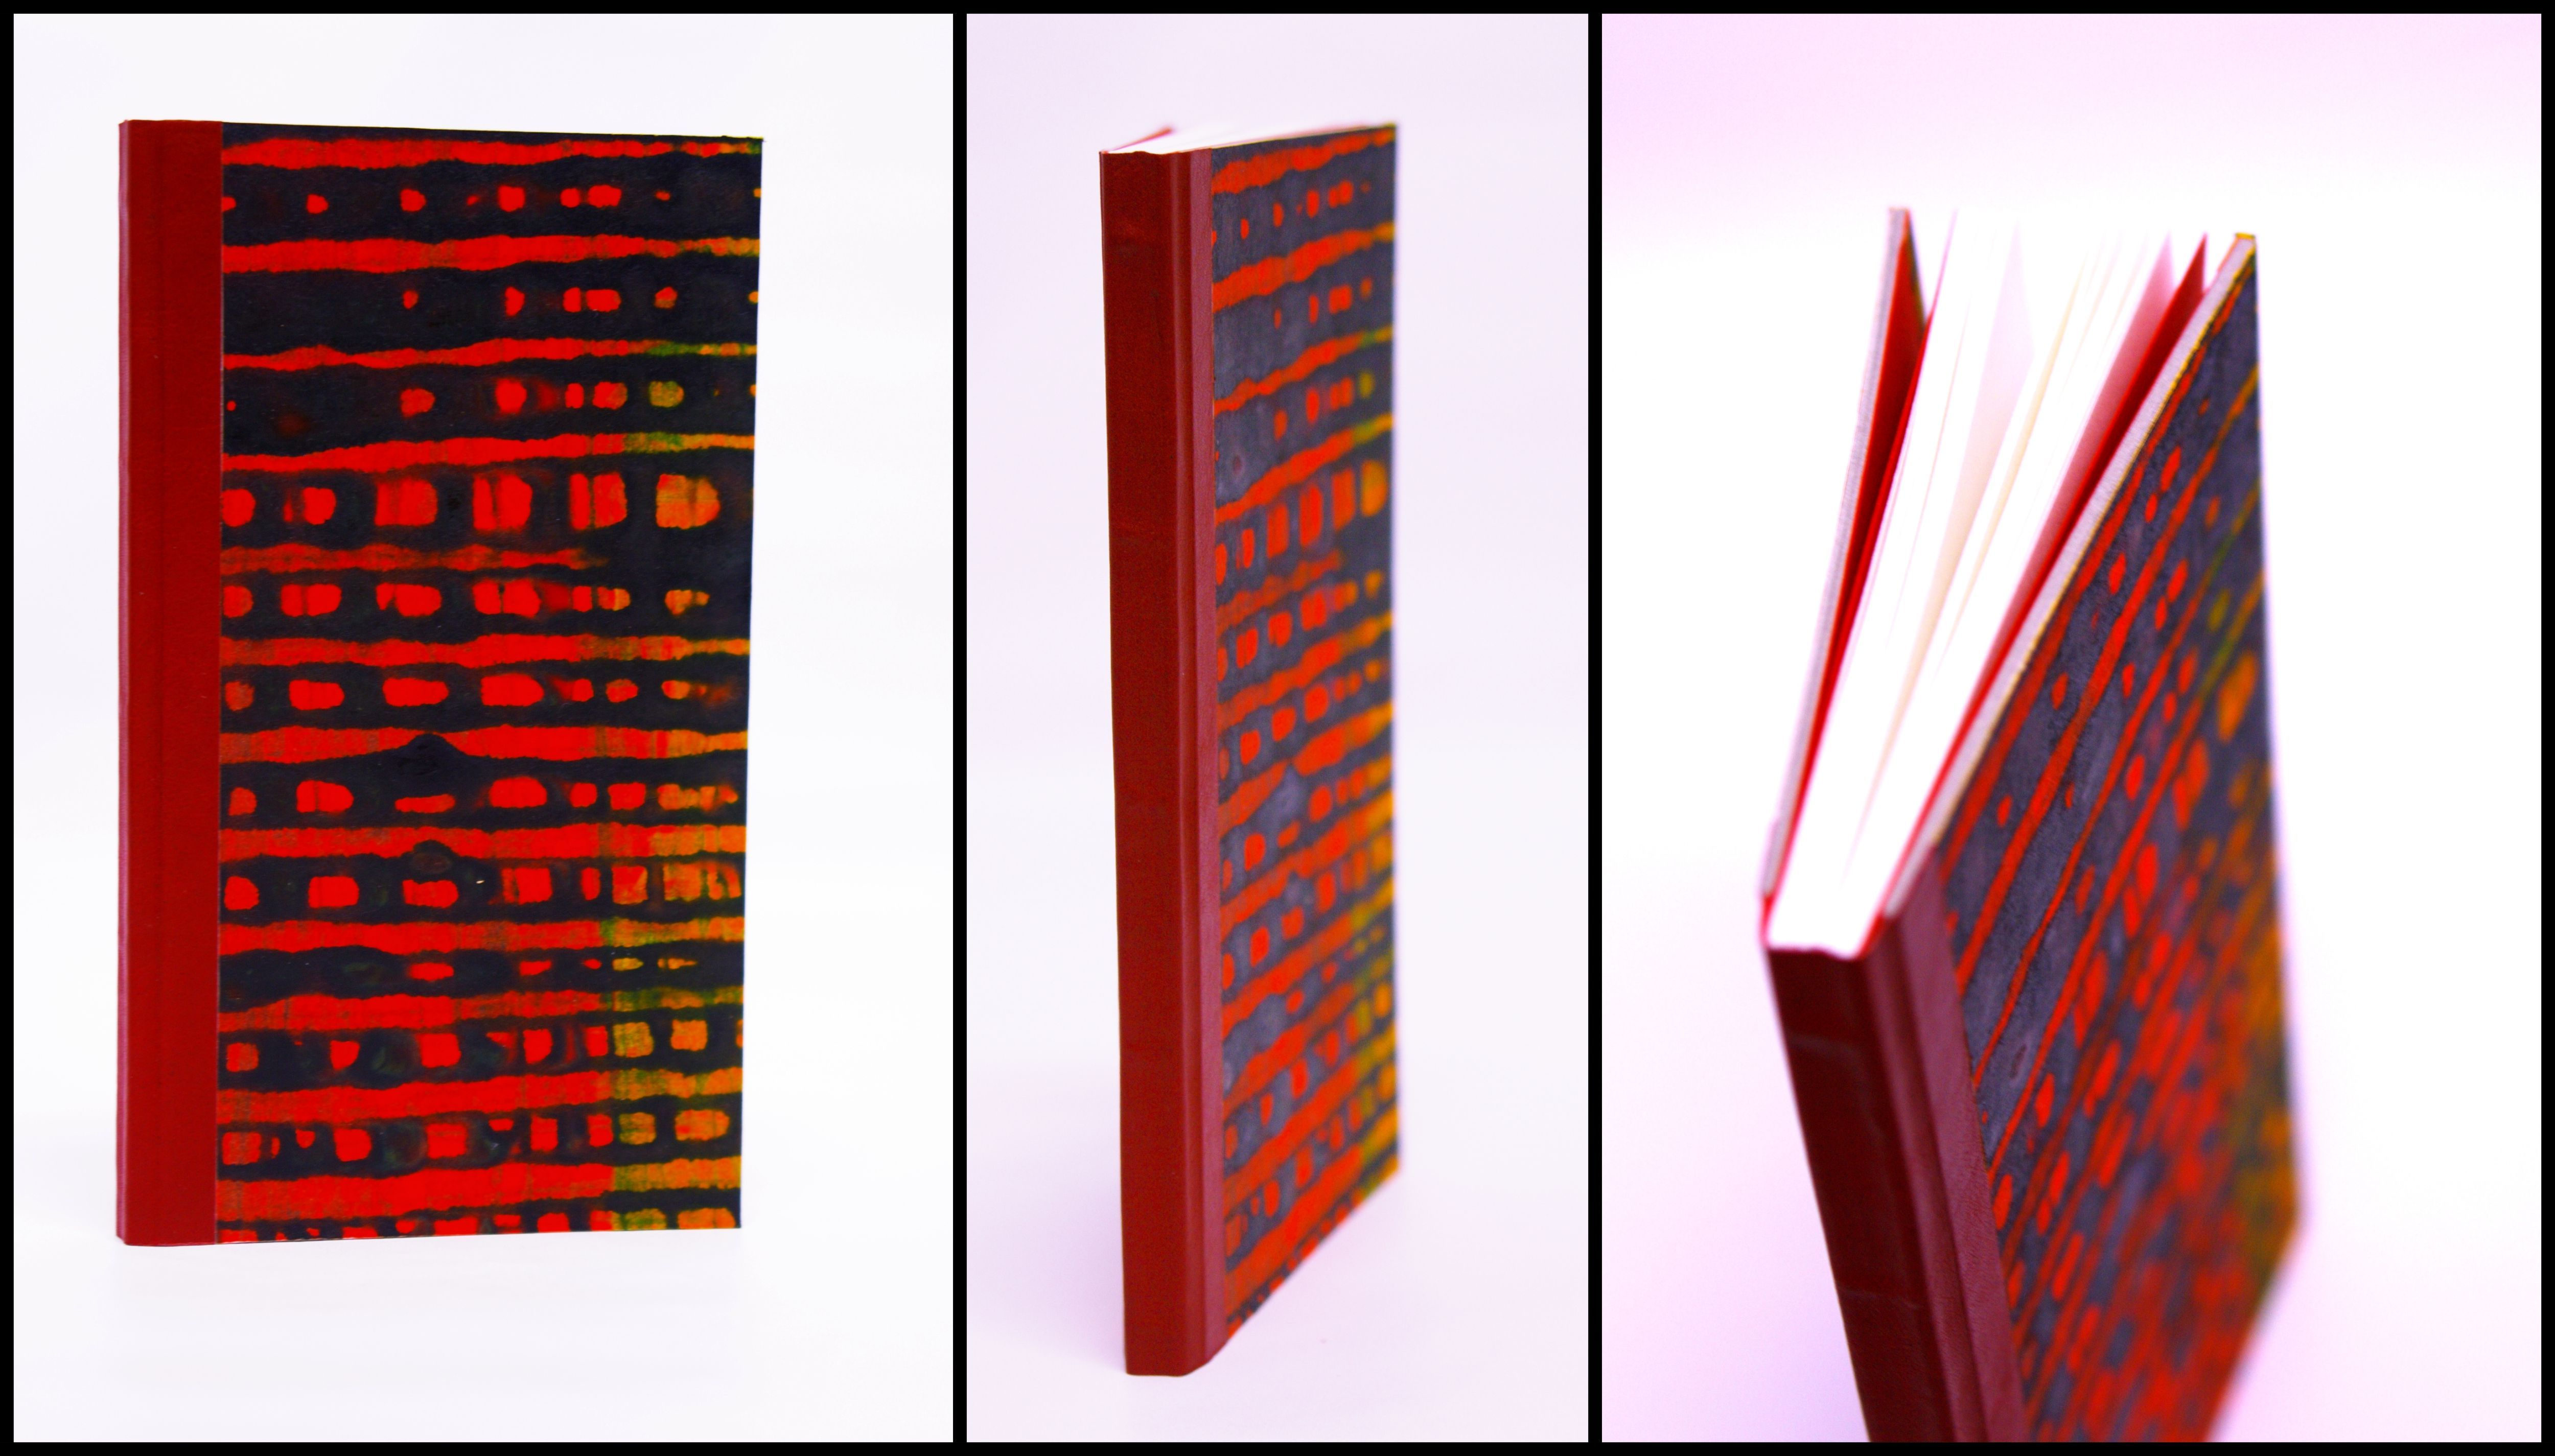 Notebook designed and handmade by Jaanika Aadamsoo